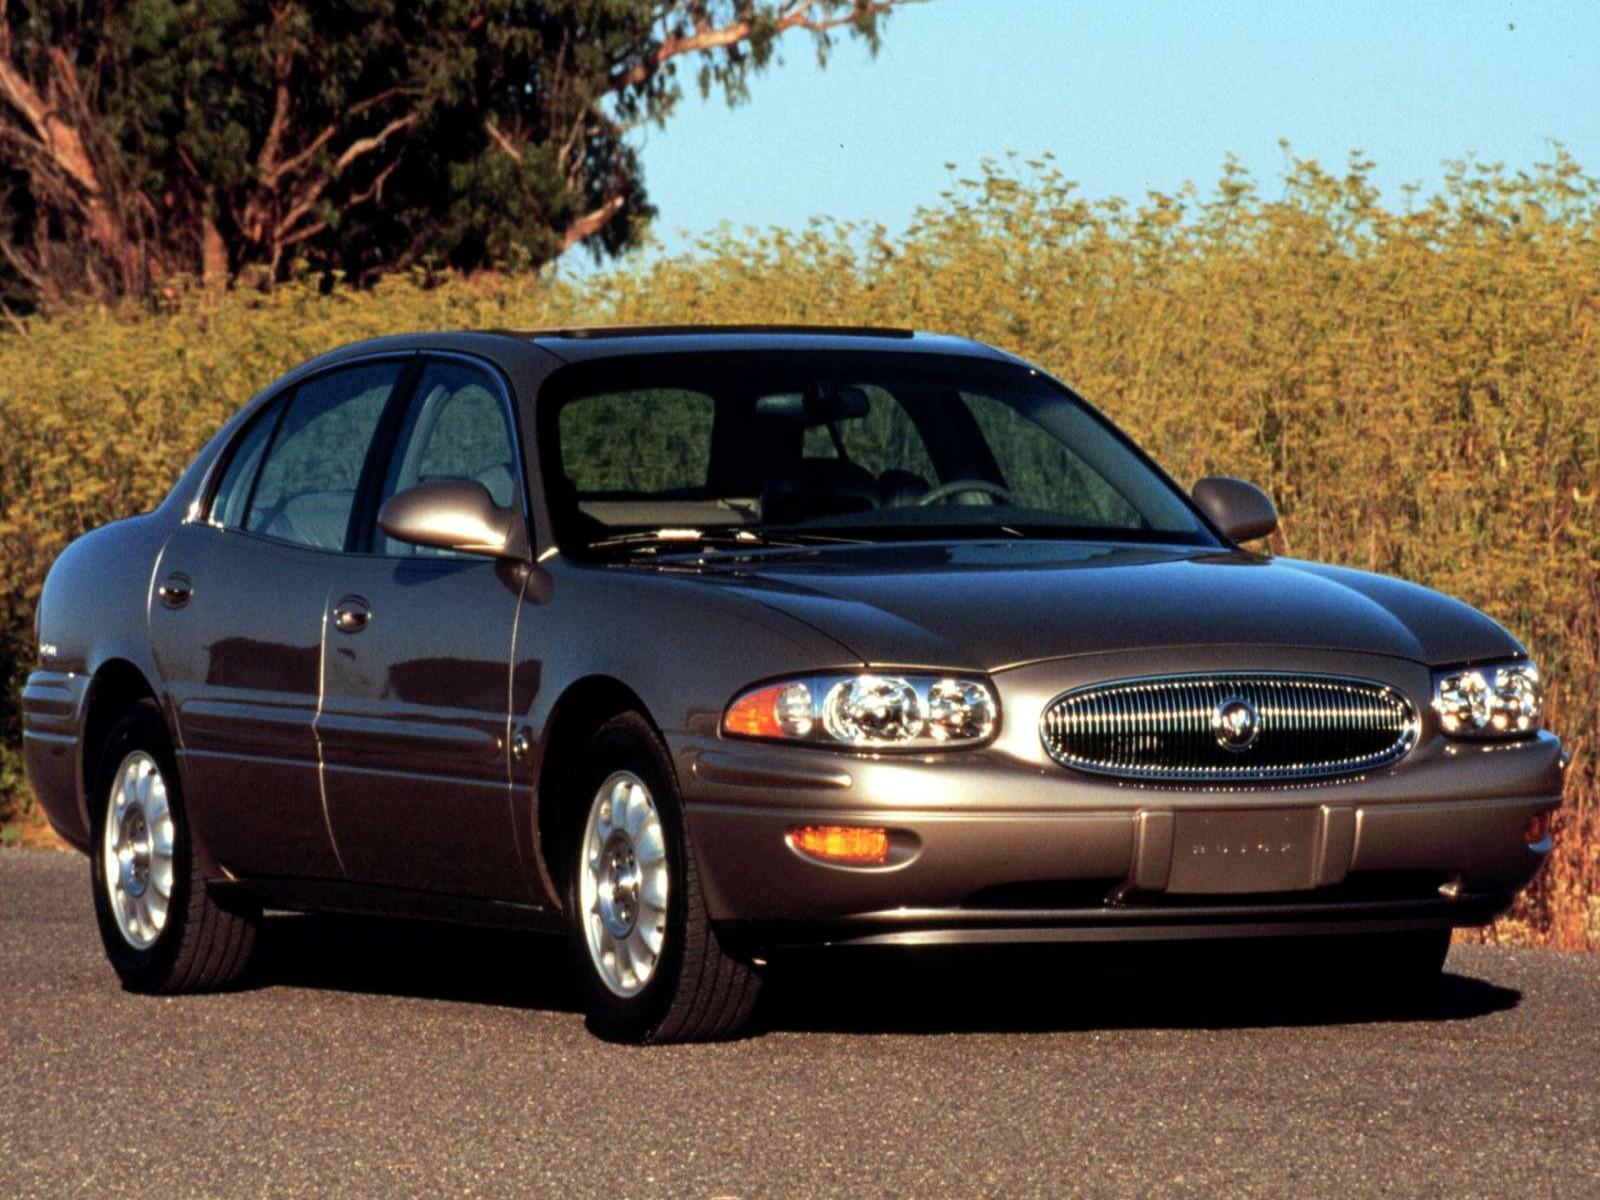 Buick Lesabre Limited on 1999 Buick Lesabre Limited